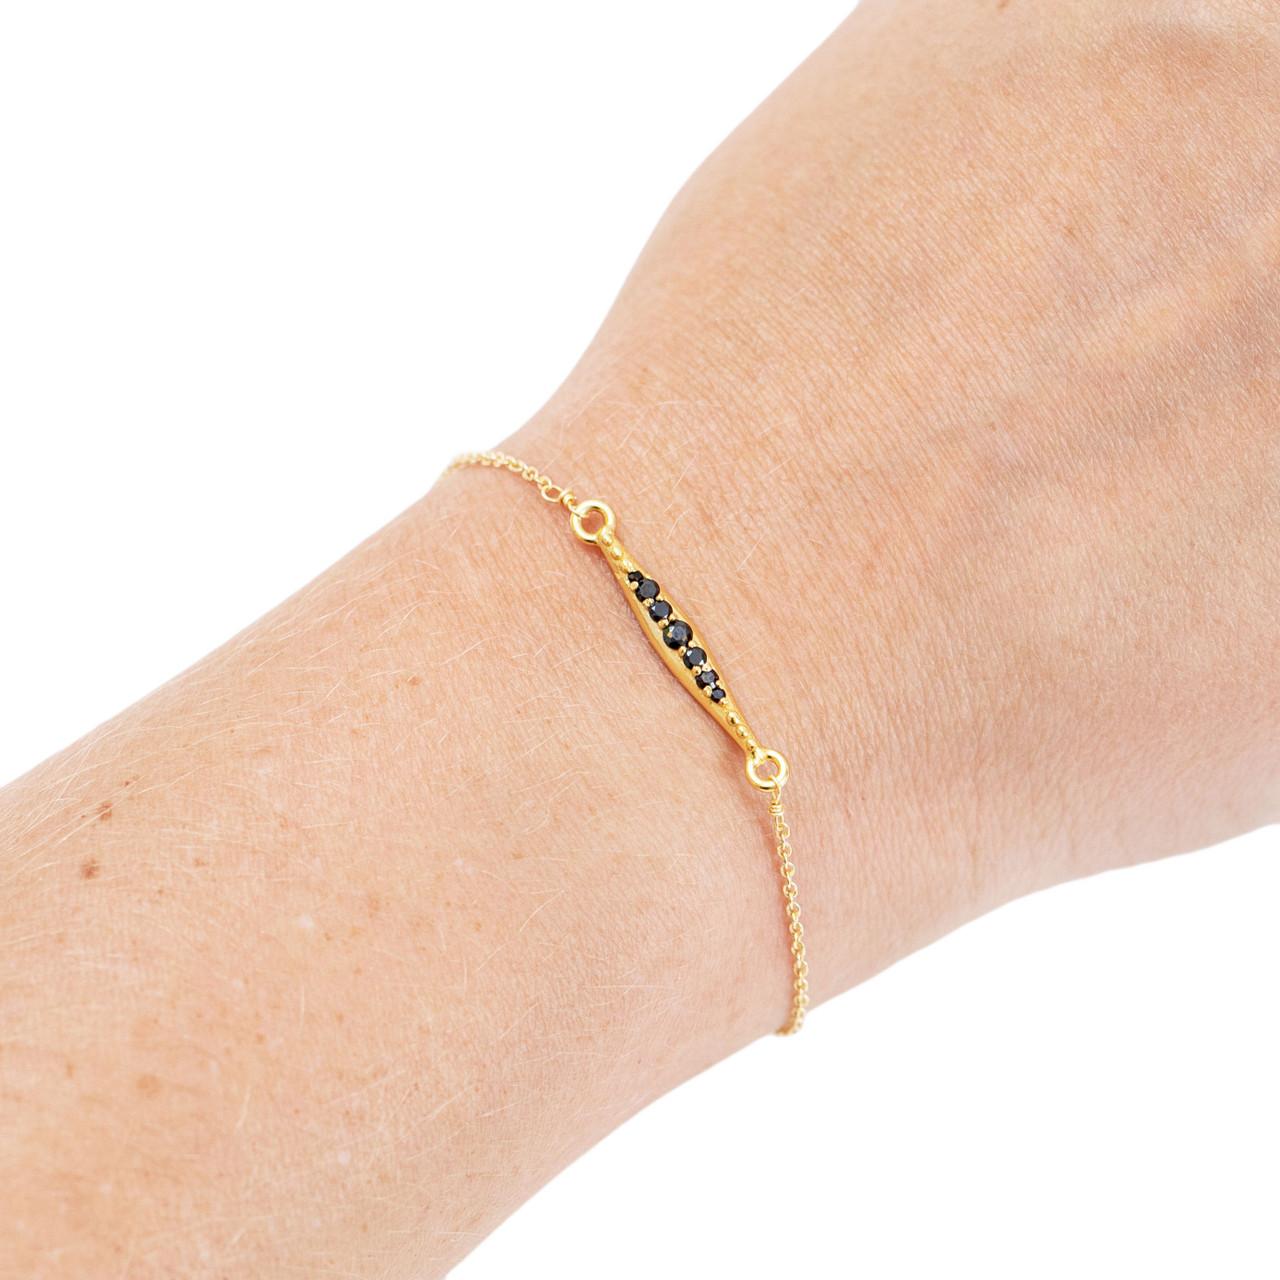 Gold Plated Bracelet with Row of Black Zircon Stones